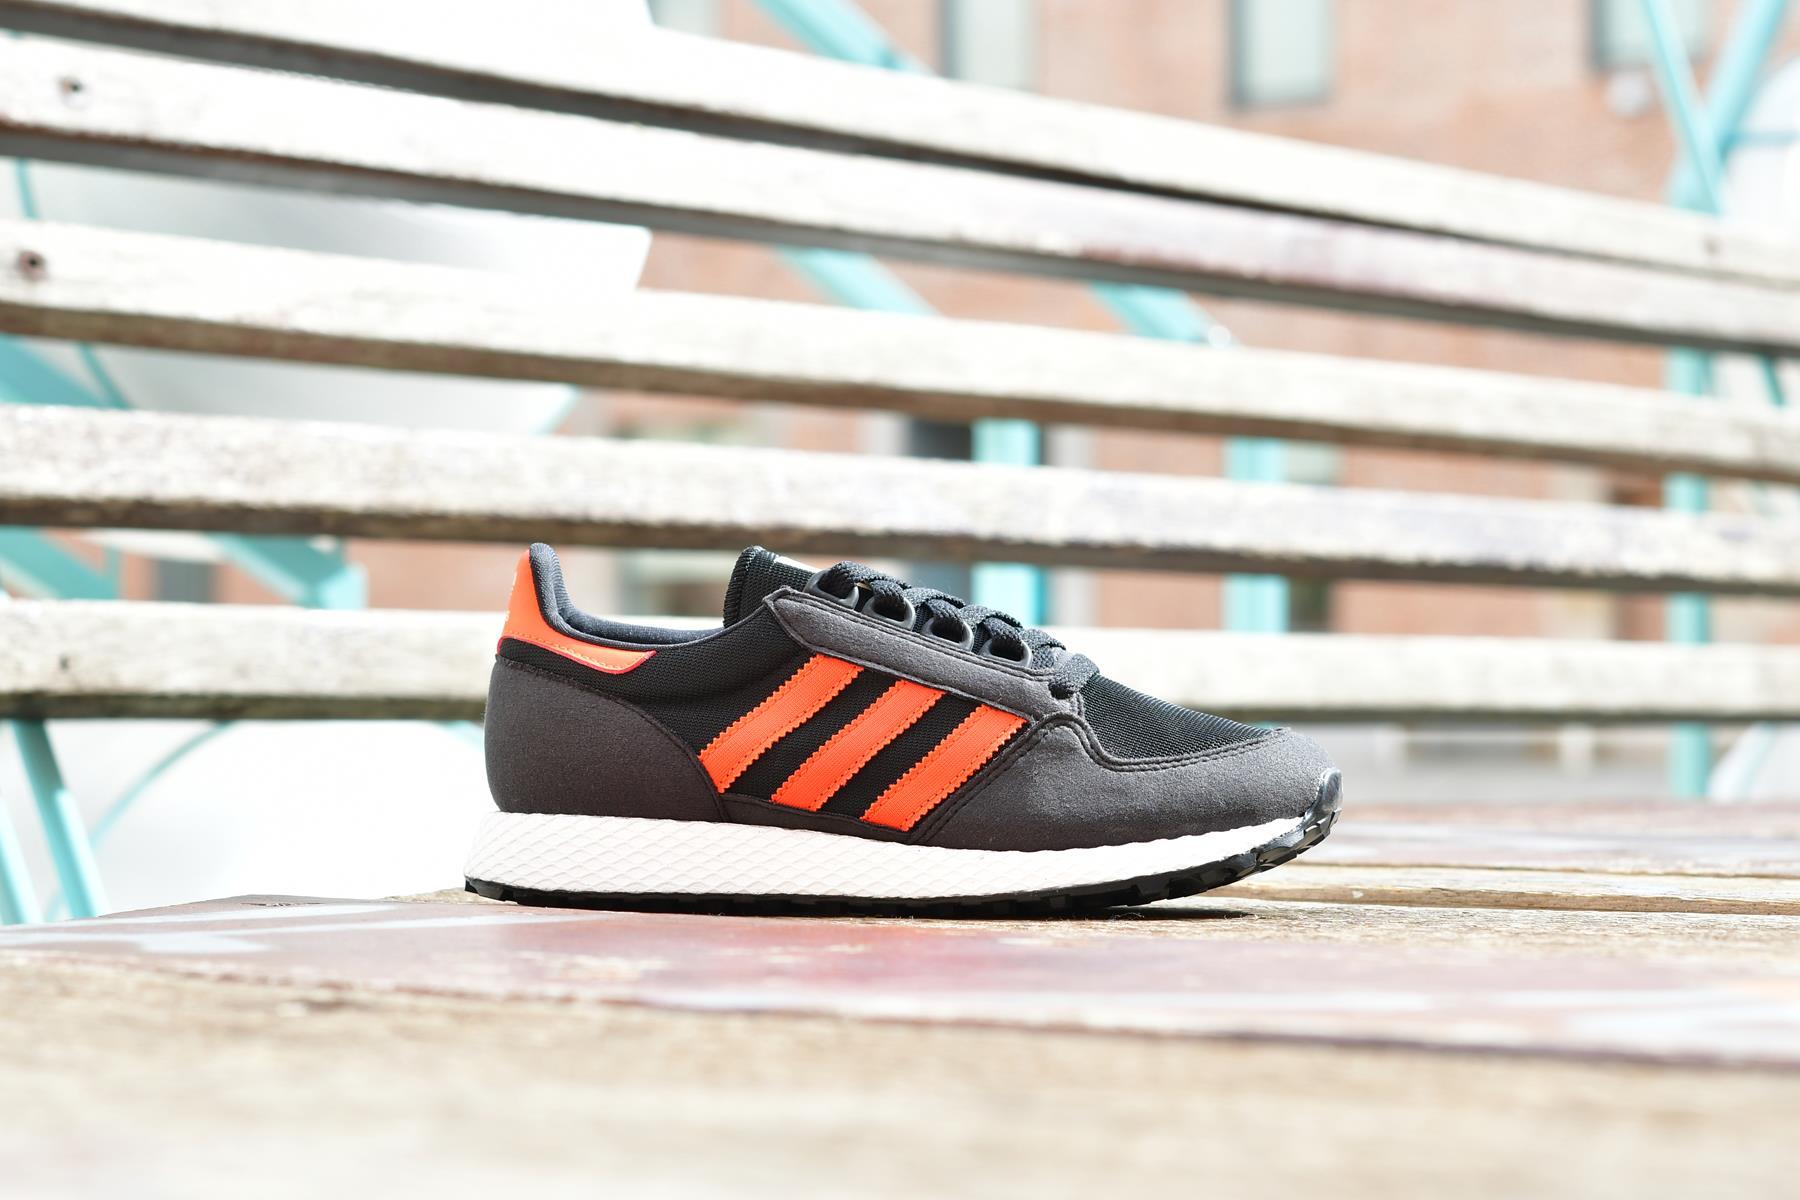 CG6507_AmorShoes-adidas-Originals-Forest-Grove-oregon-Core-Black-Active-Orange-Easy-Yellow-Zapatilla-Retro-Running-piel-vuelta-nylon-negra-Rayas-naranjas-CG6507